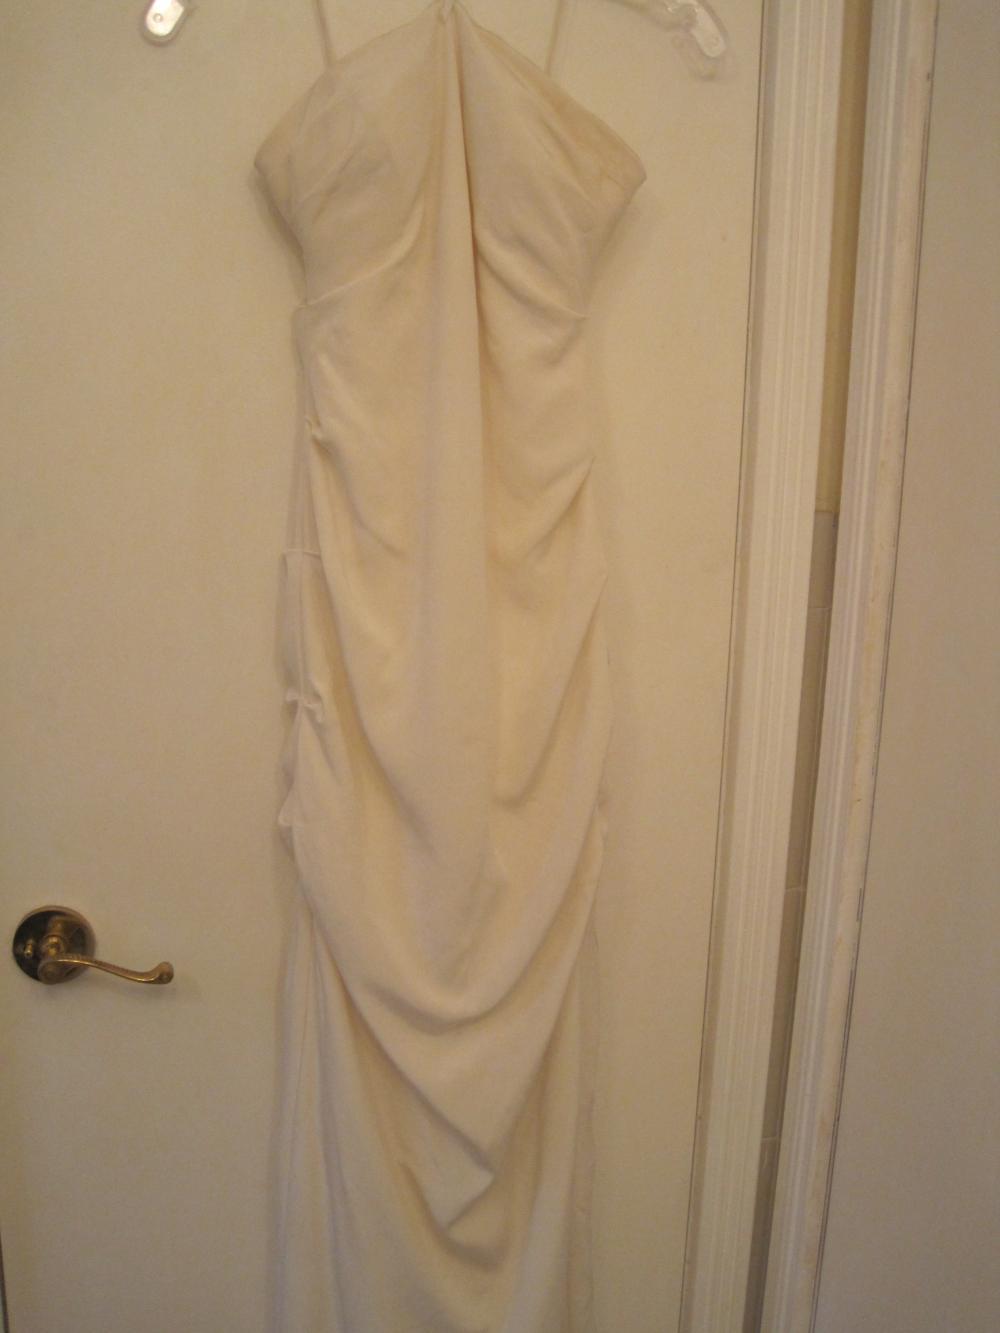 Nicole Miller Dress CO0035 - Size 2